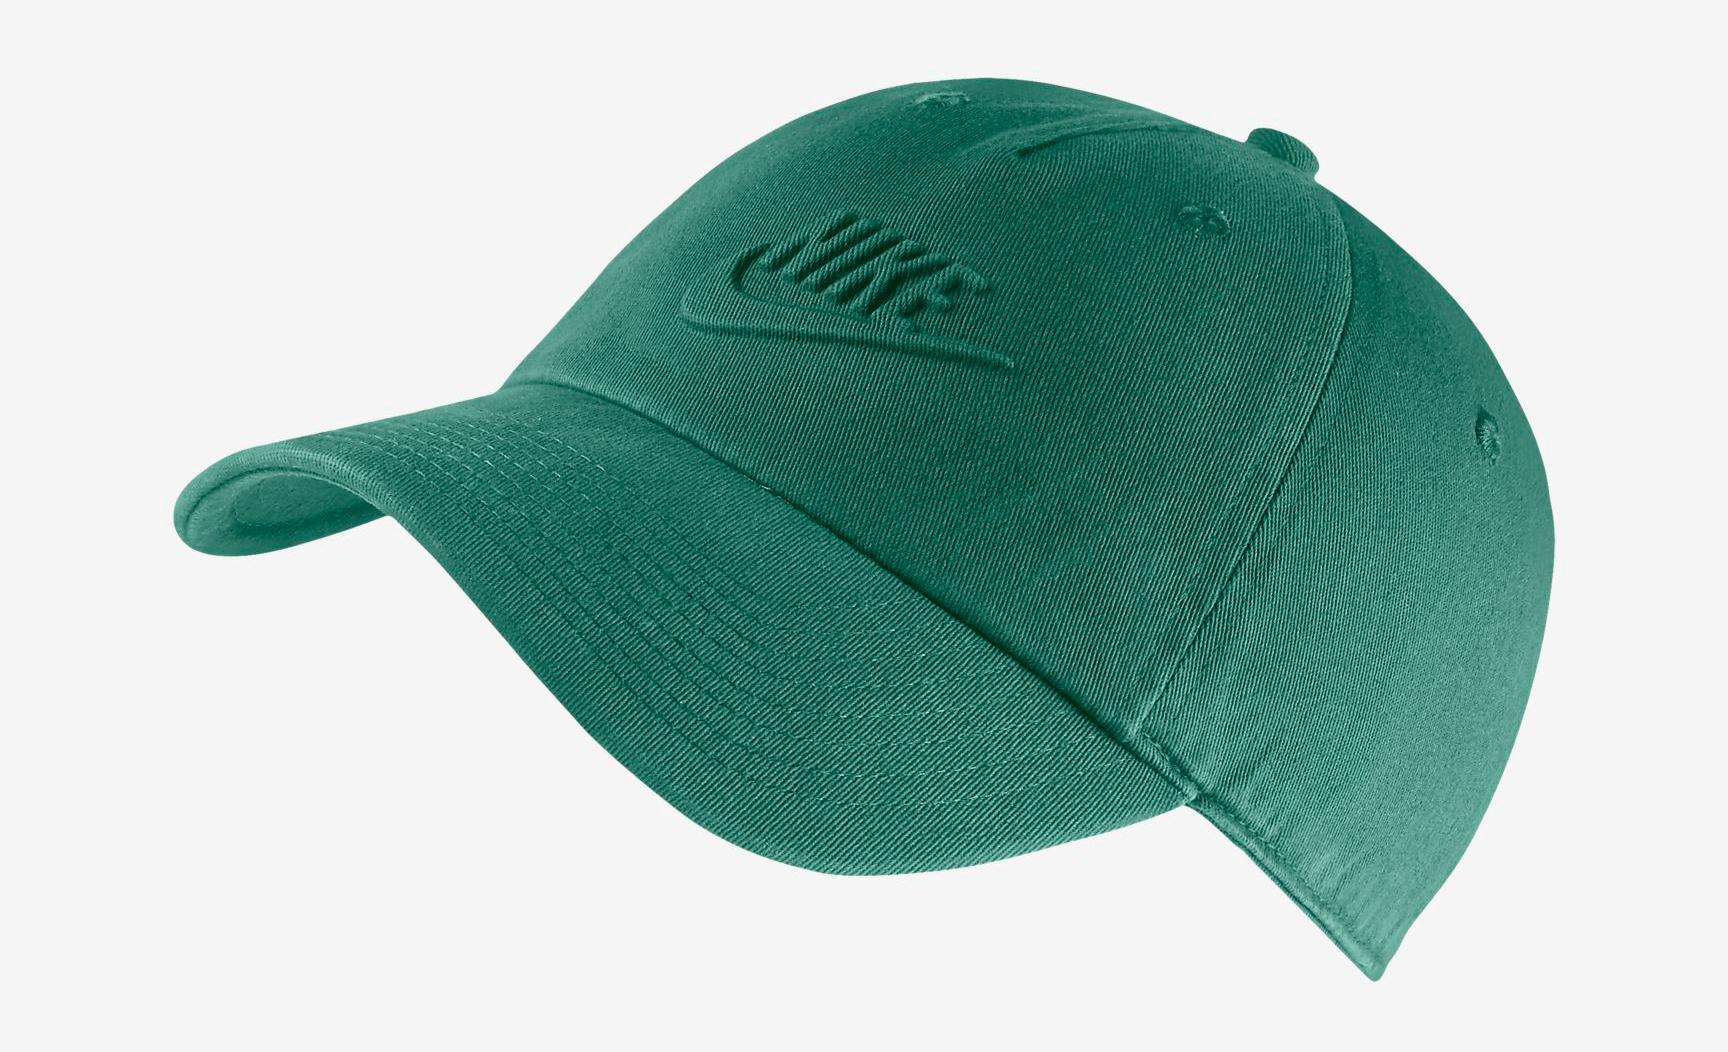 nike watermelon south beach hat match green 1